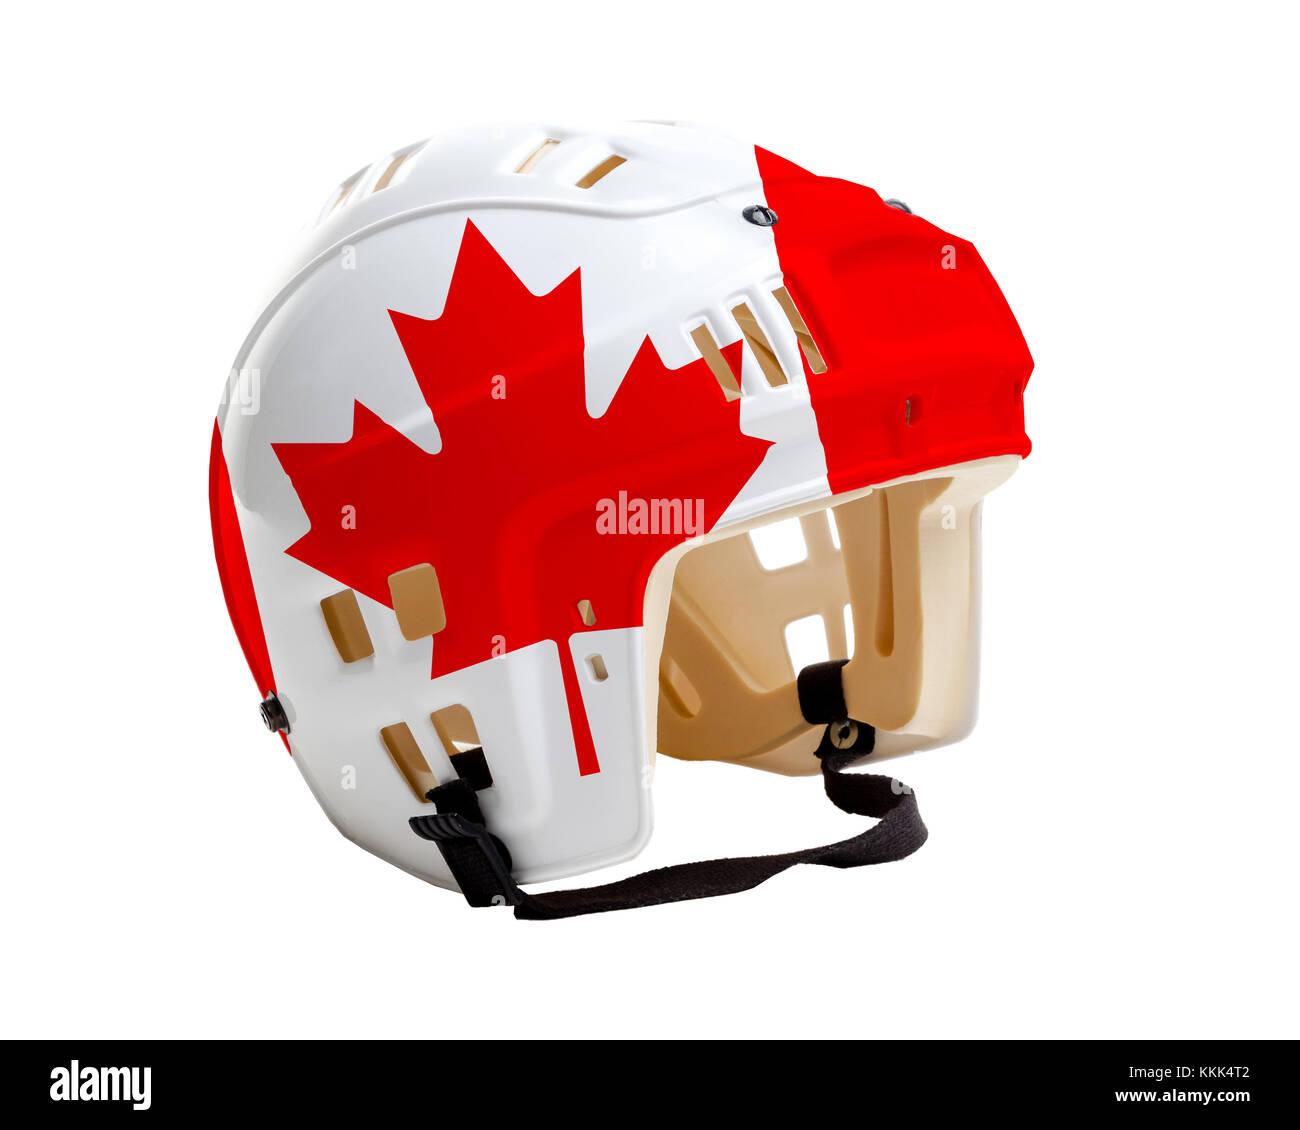 Ice hockey helmet with Canada flag painted on it. Isolated on white background - Stock Image